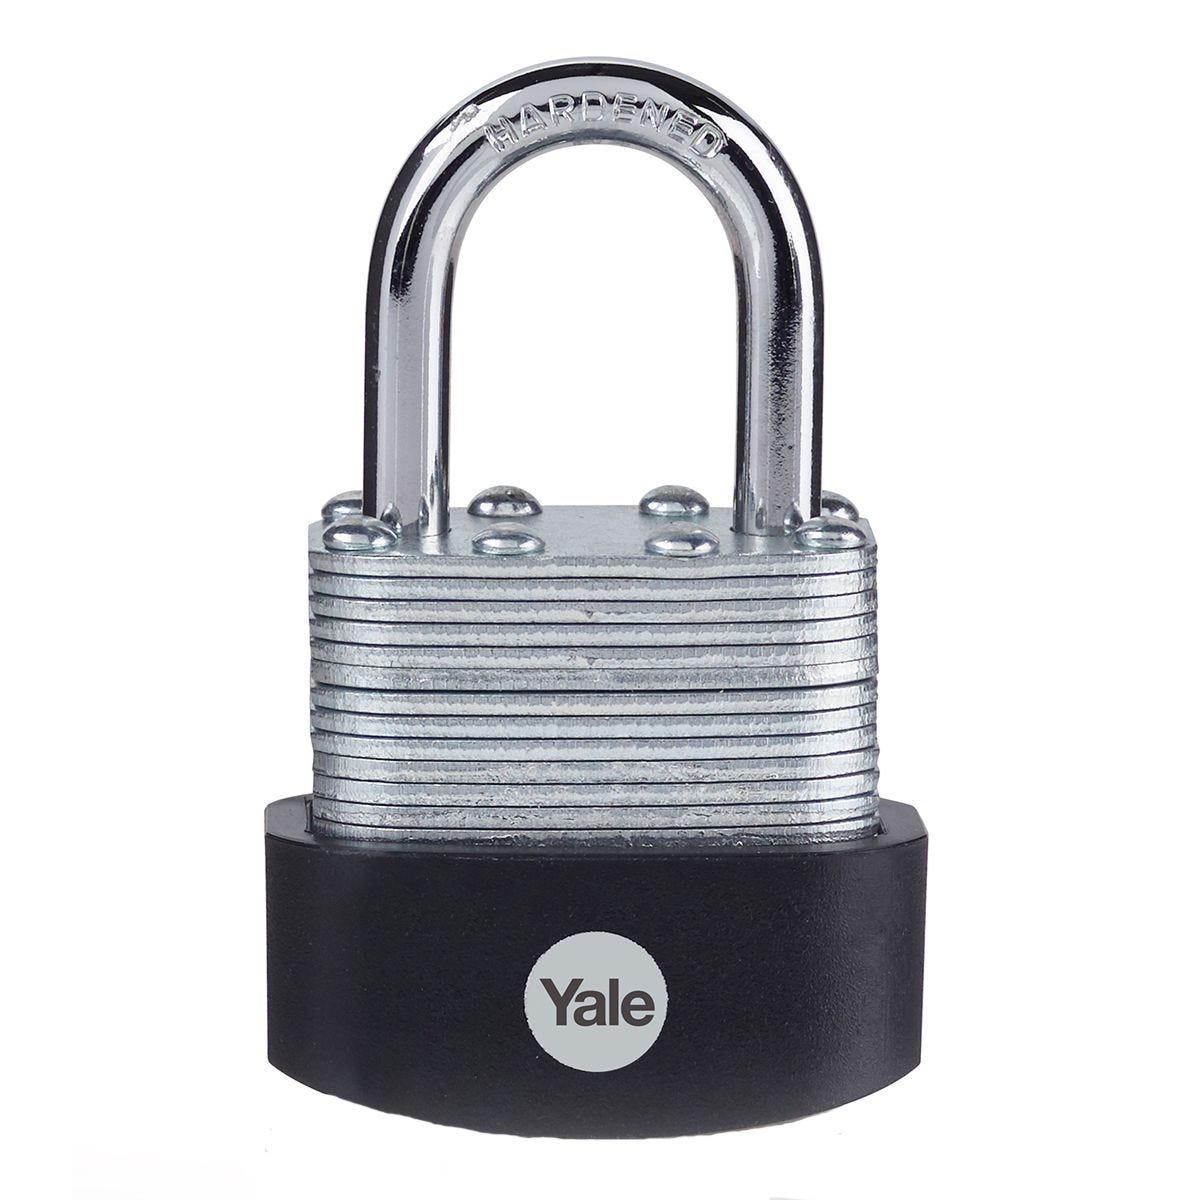 Yale Laminated Steel Padlock 40mm - Pack of 3